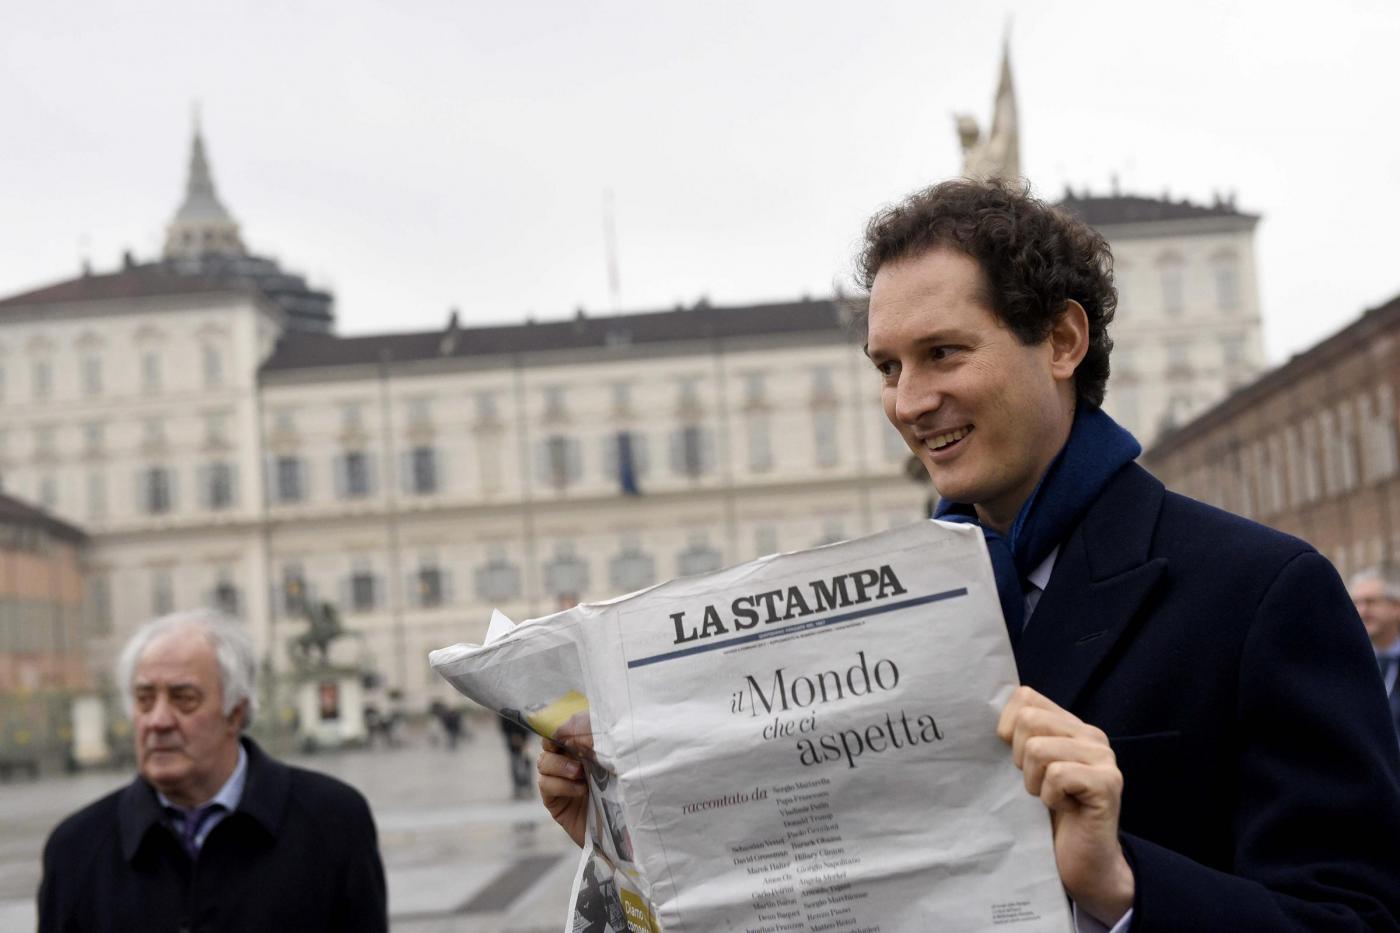 JOHN ELKANN/ Cara Inter, non sai perdere (anche se sei abituata)!